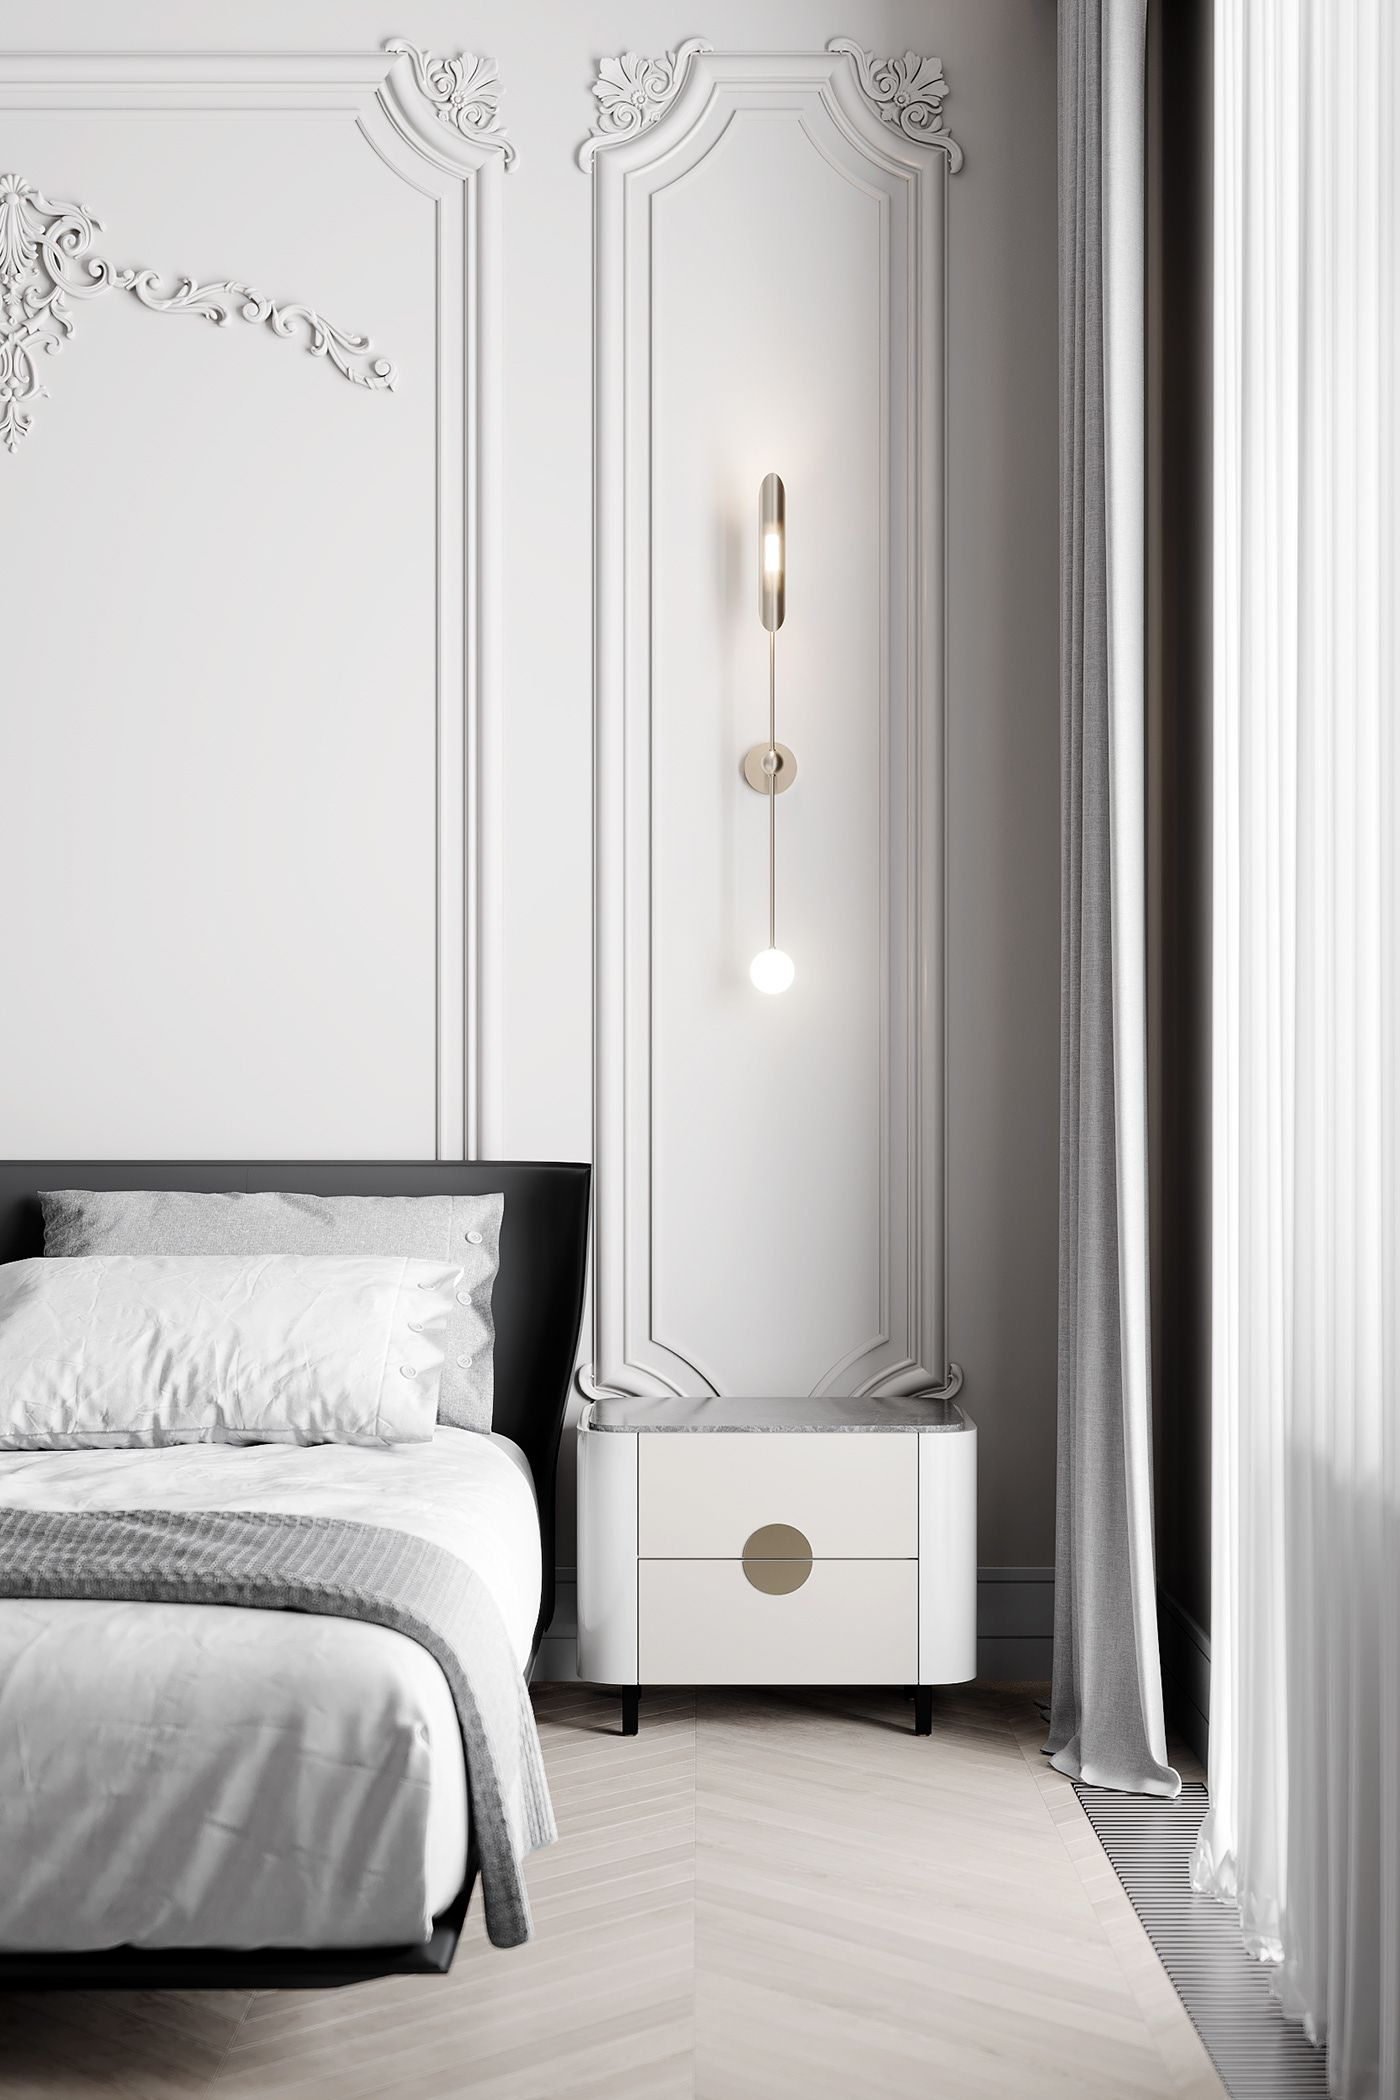 Tikhaya Classica On Behance Apartment Interior Design Luxurious Bedrooms Home Decor